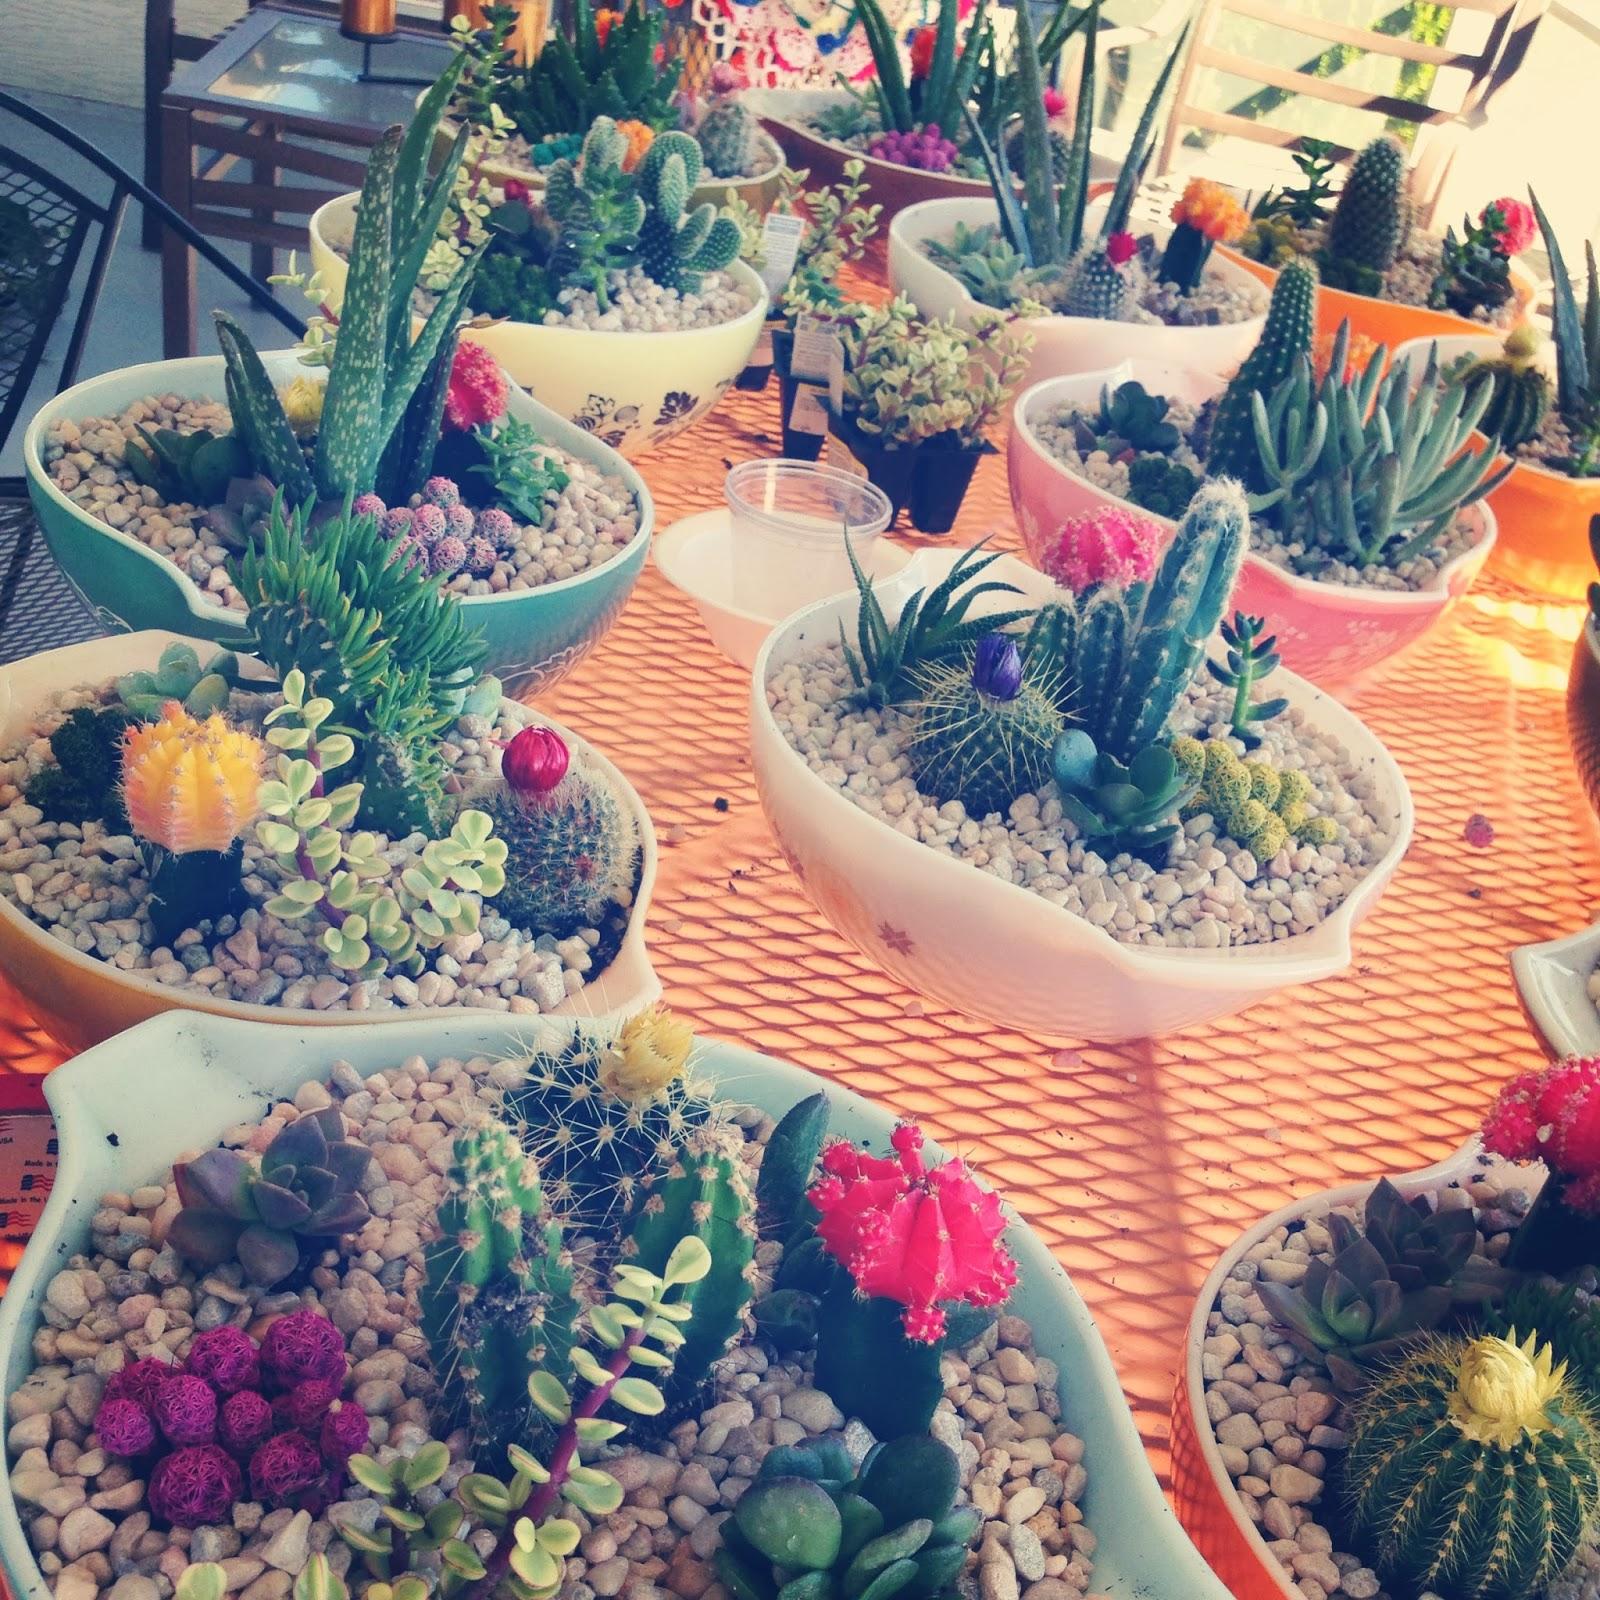 loose shoelaces diy cacti wedding centerpieces. Black Bedroom Furniture Sets. Home Design Ideas